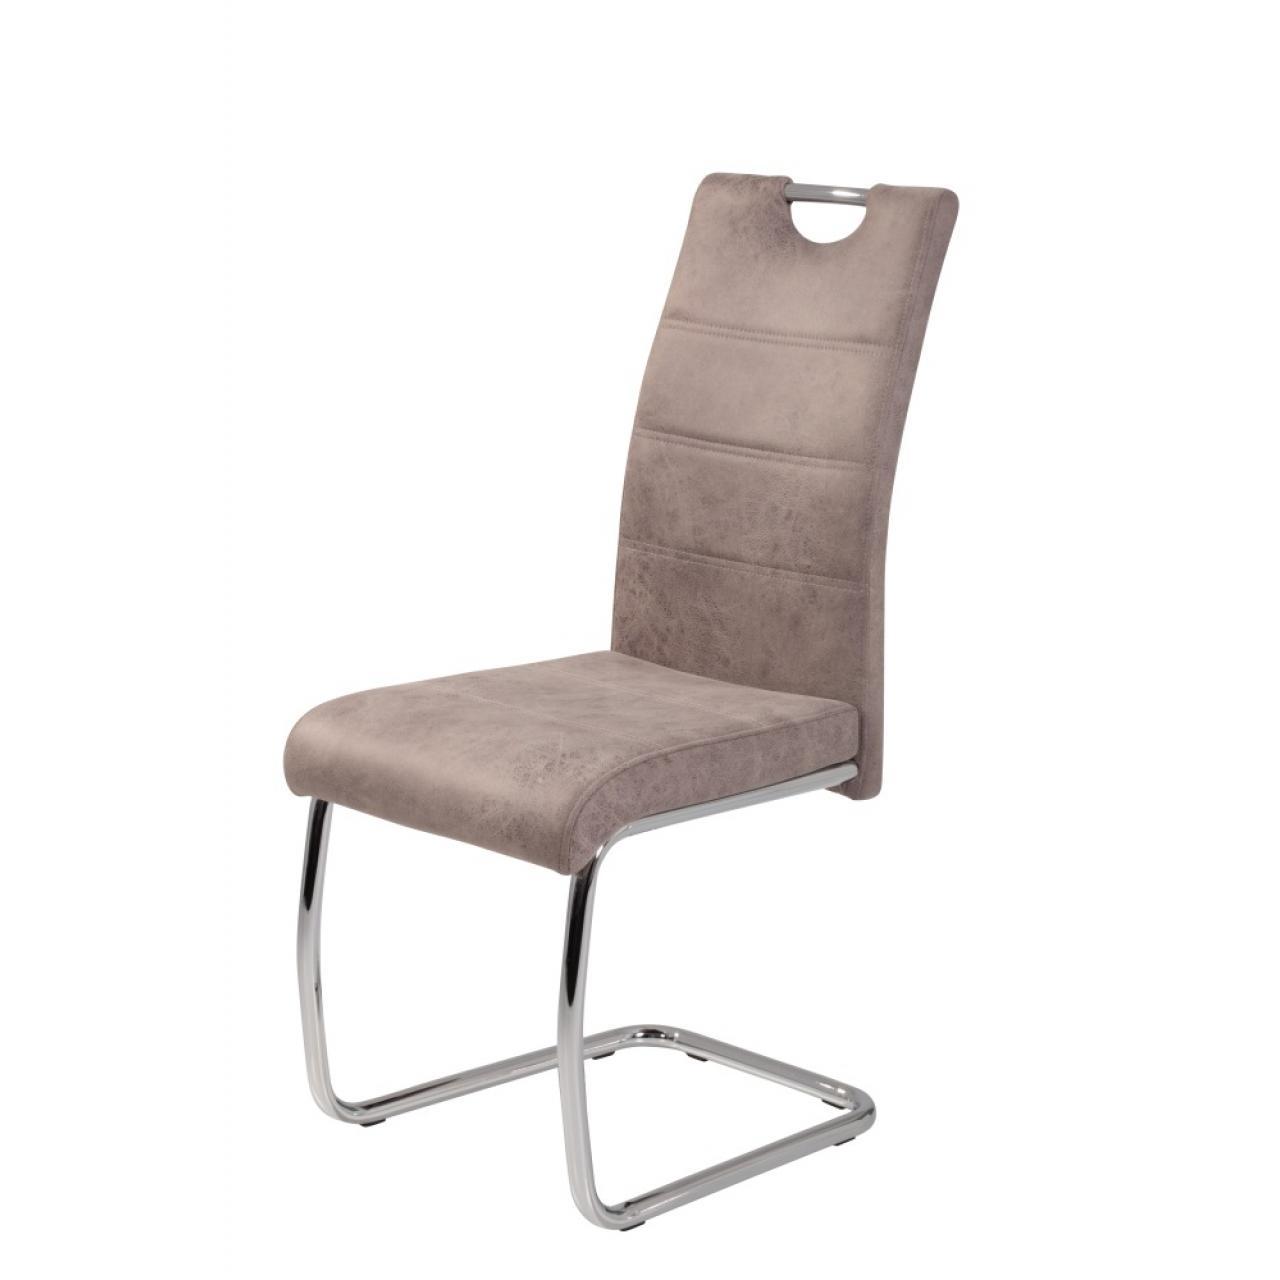 Beige Stühle schwingstuhl flora ii s vintage beige stühle hocker esszimmer